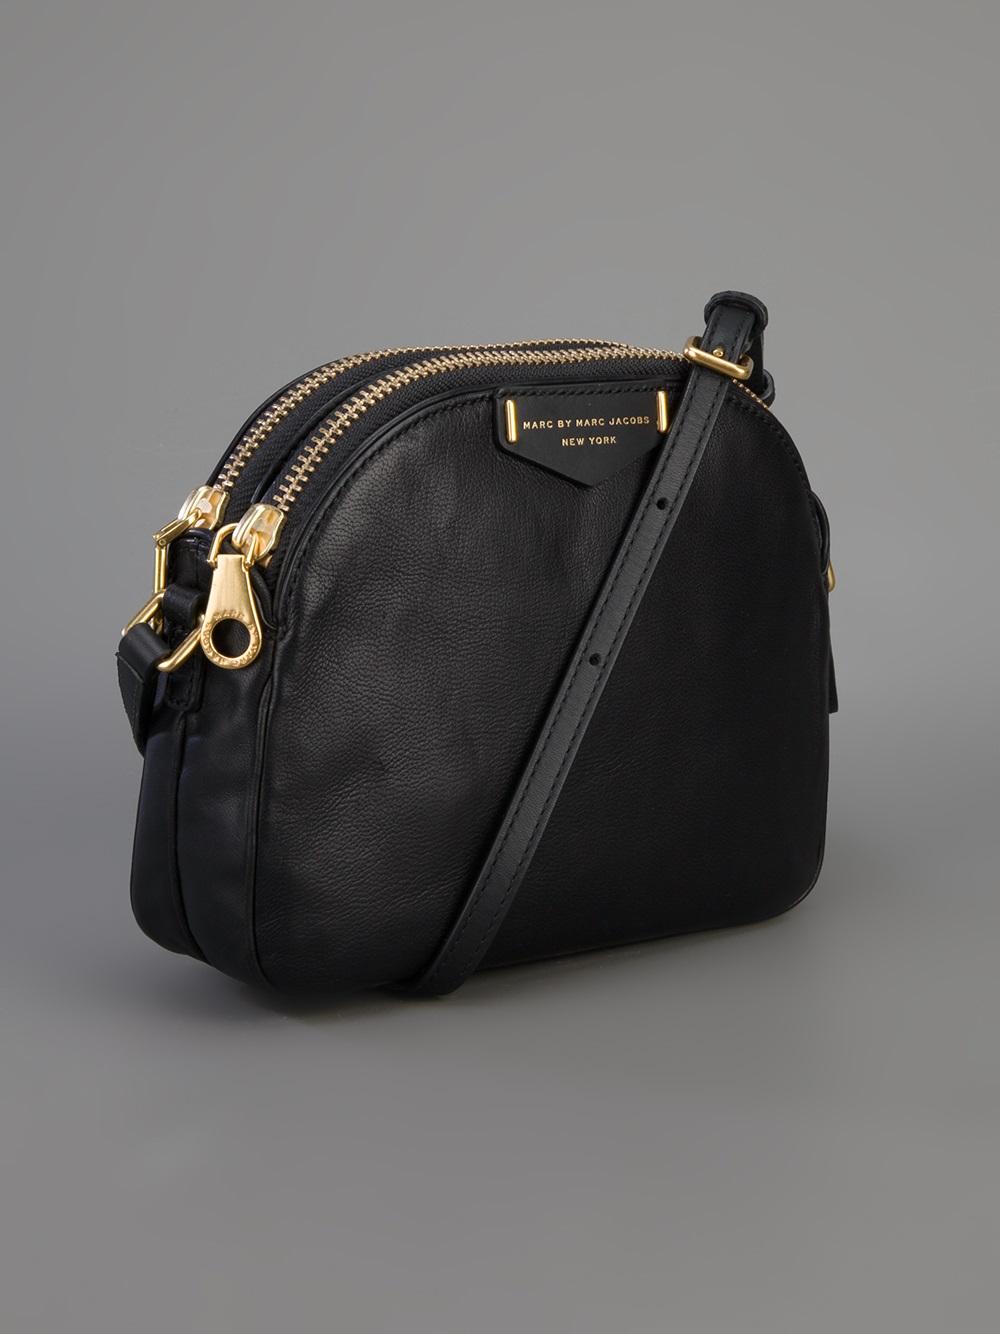 d7f9417b8ba7 Lyst - Marc By Marc Jacobs Downtown Lola Cross Body Bag in Black